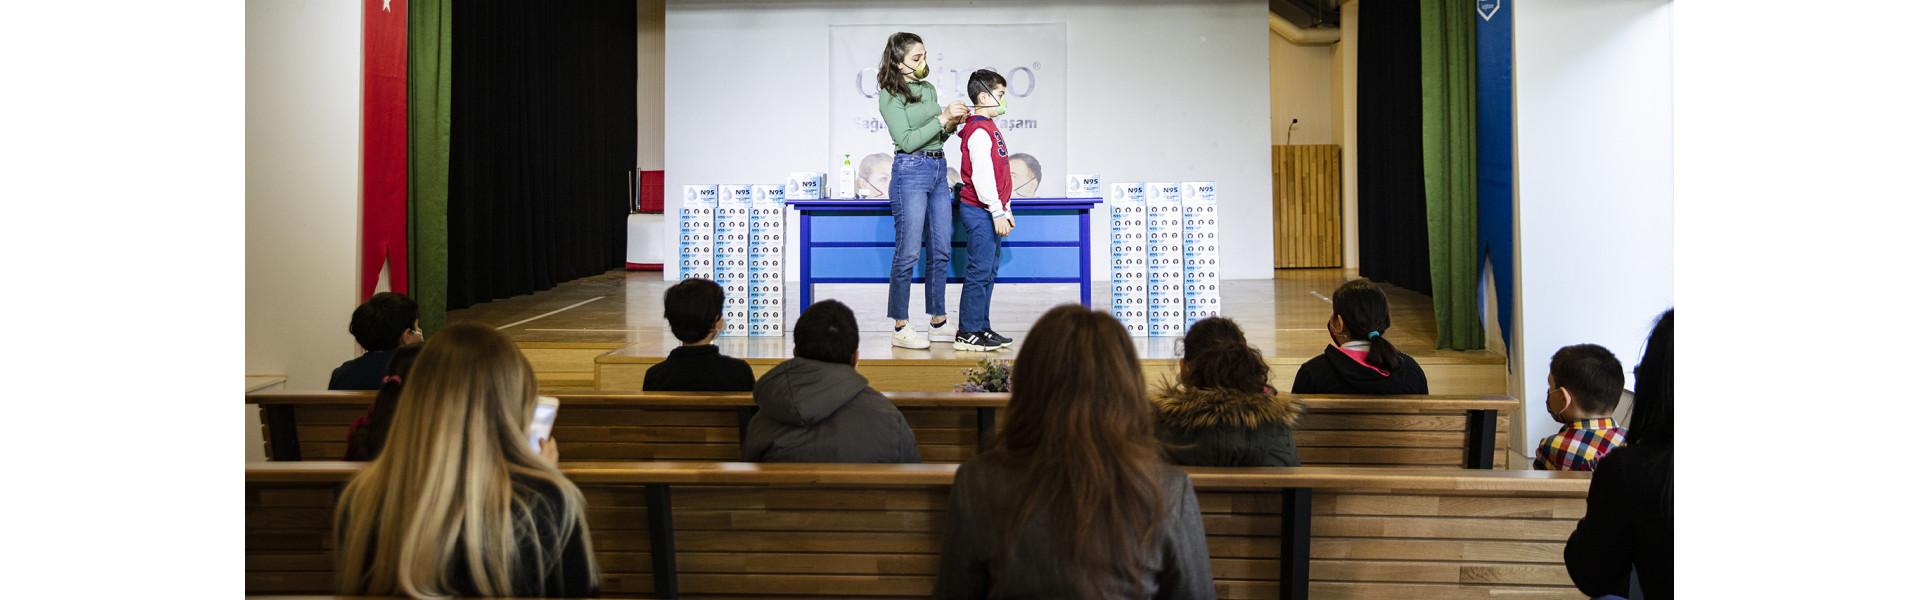 Nef İlkokulu